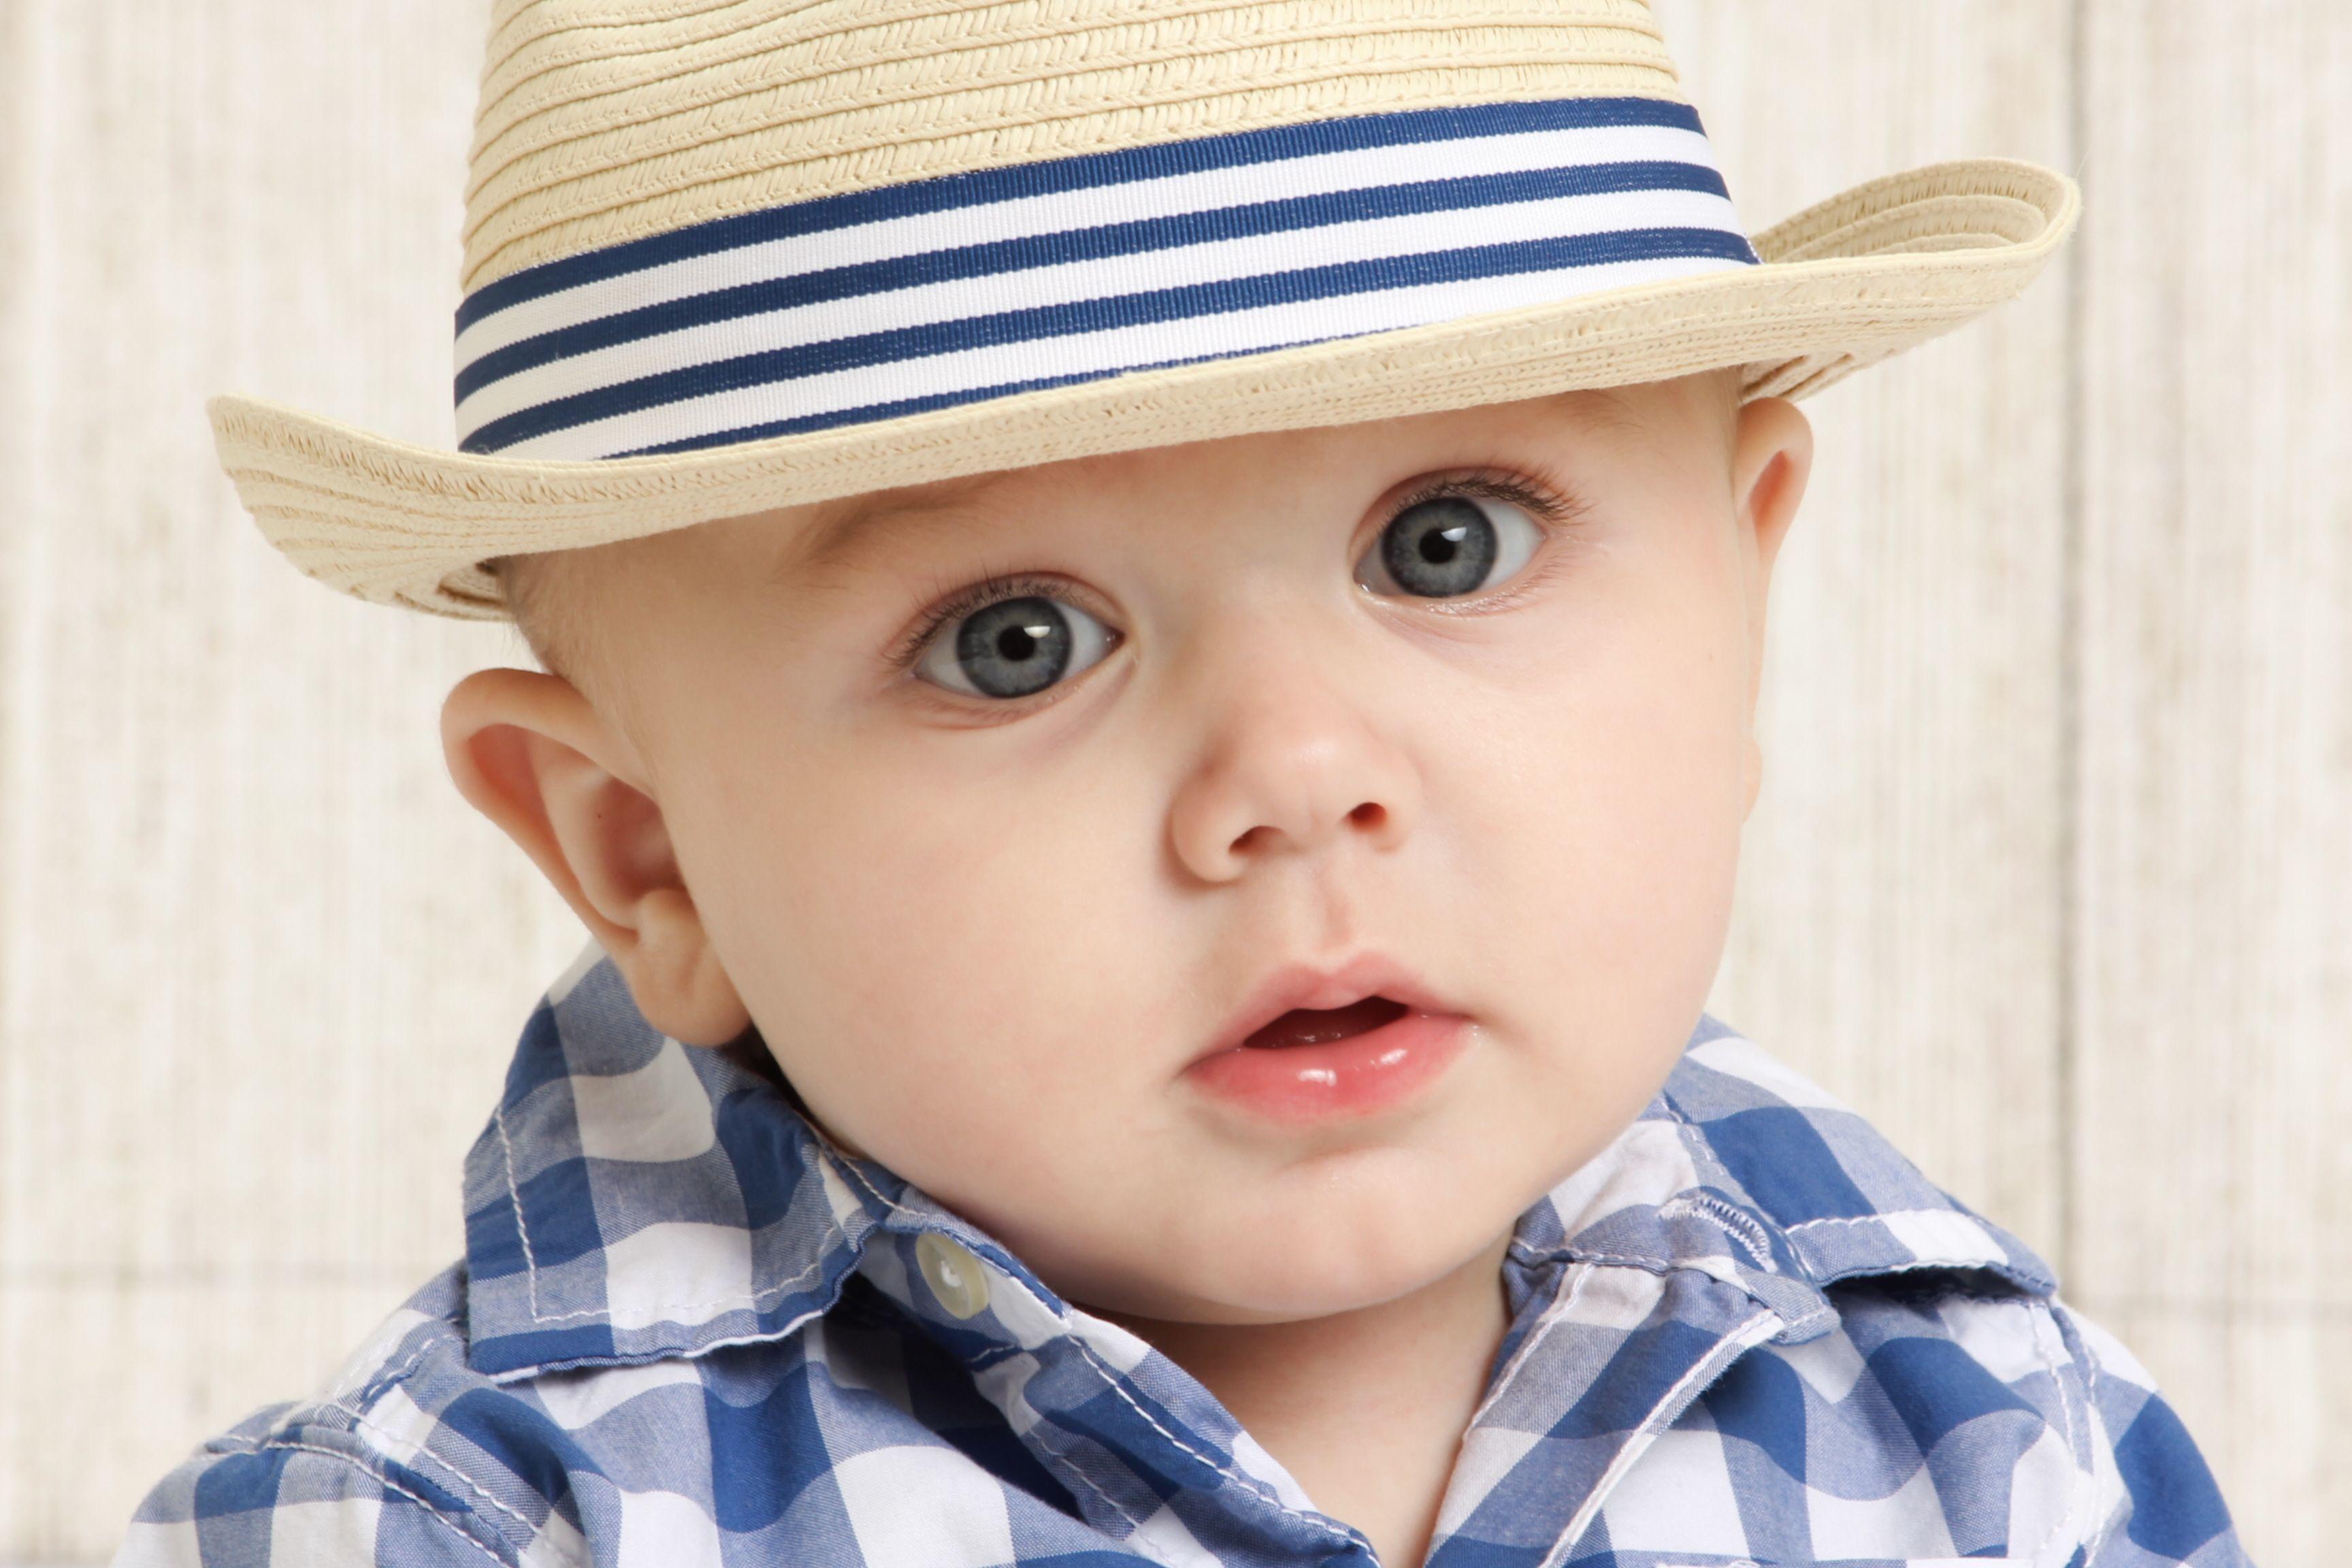 Baby_noah